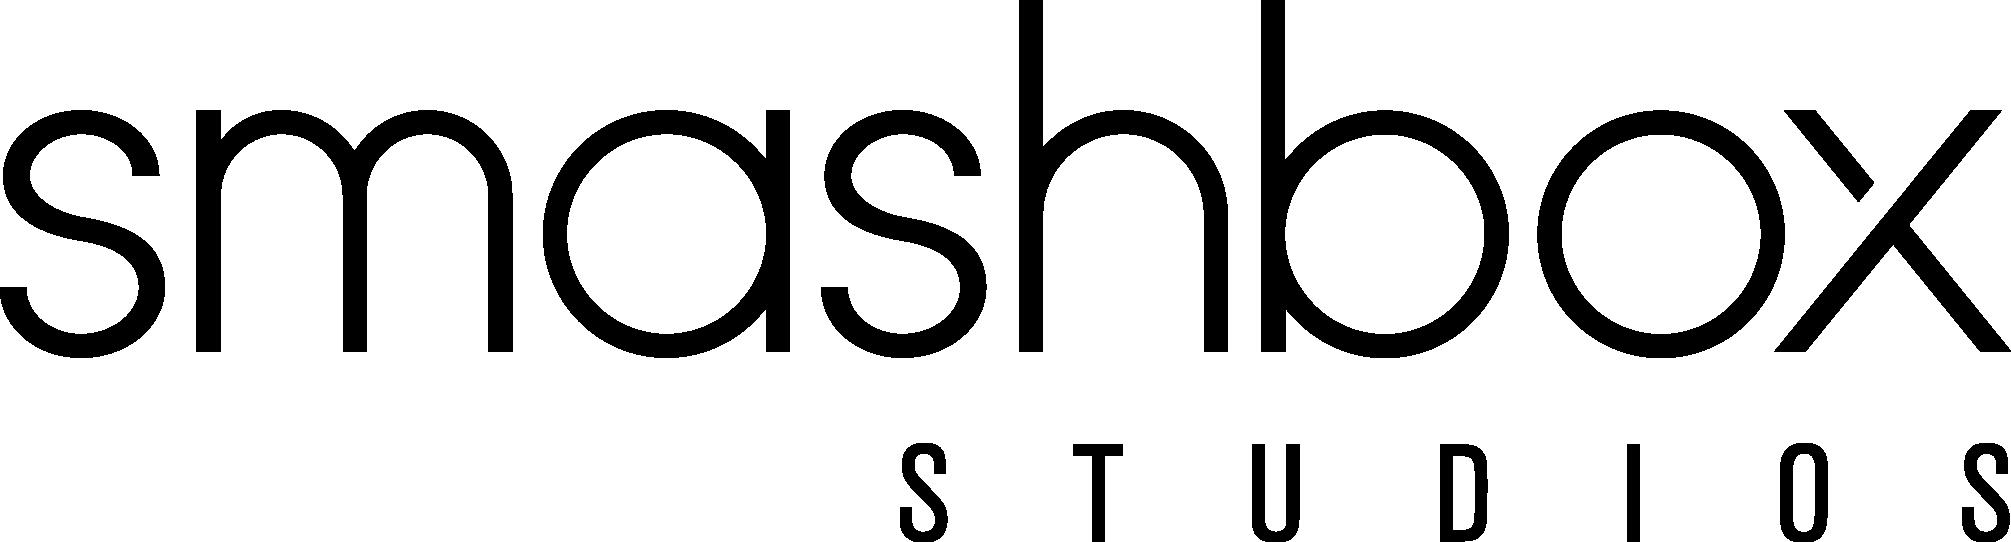 Smashbox_Studios_logo_alignedright_copy.png